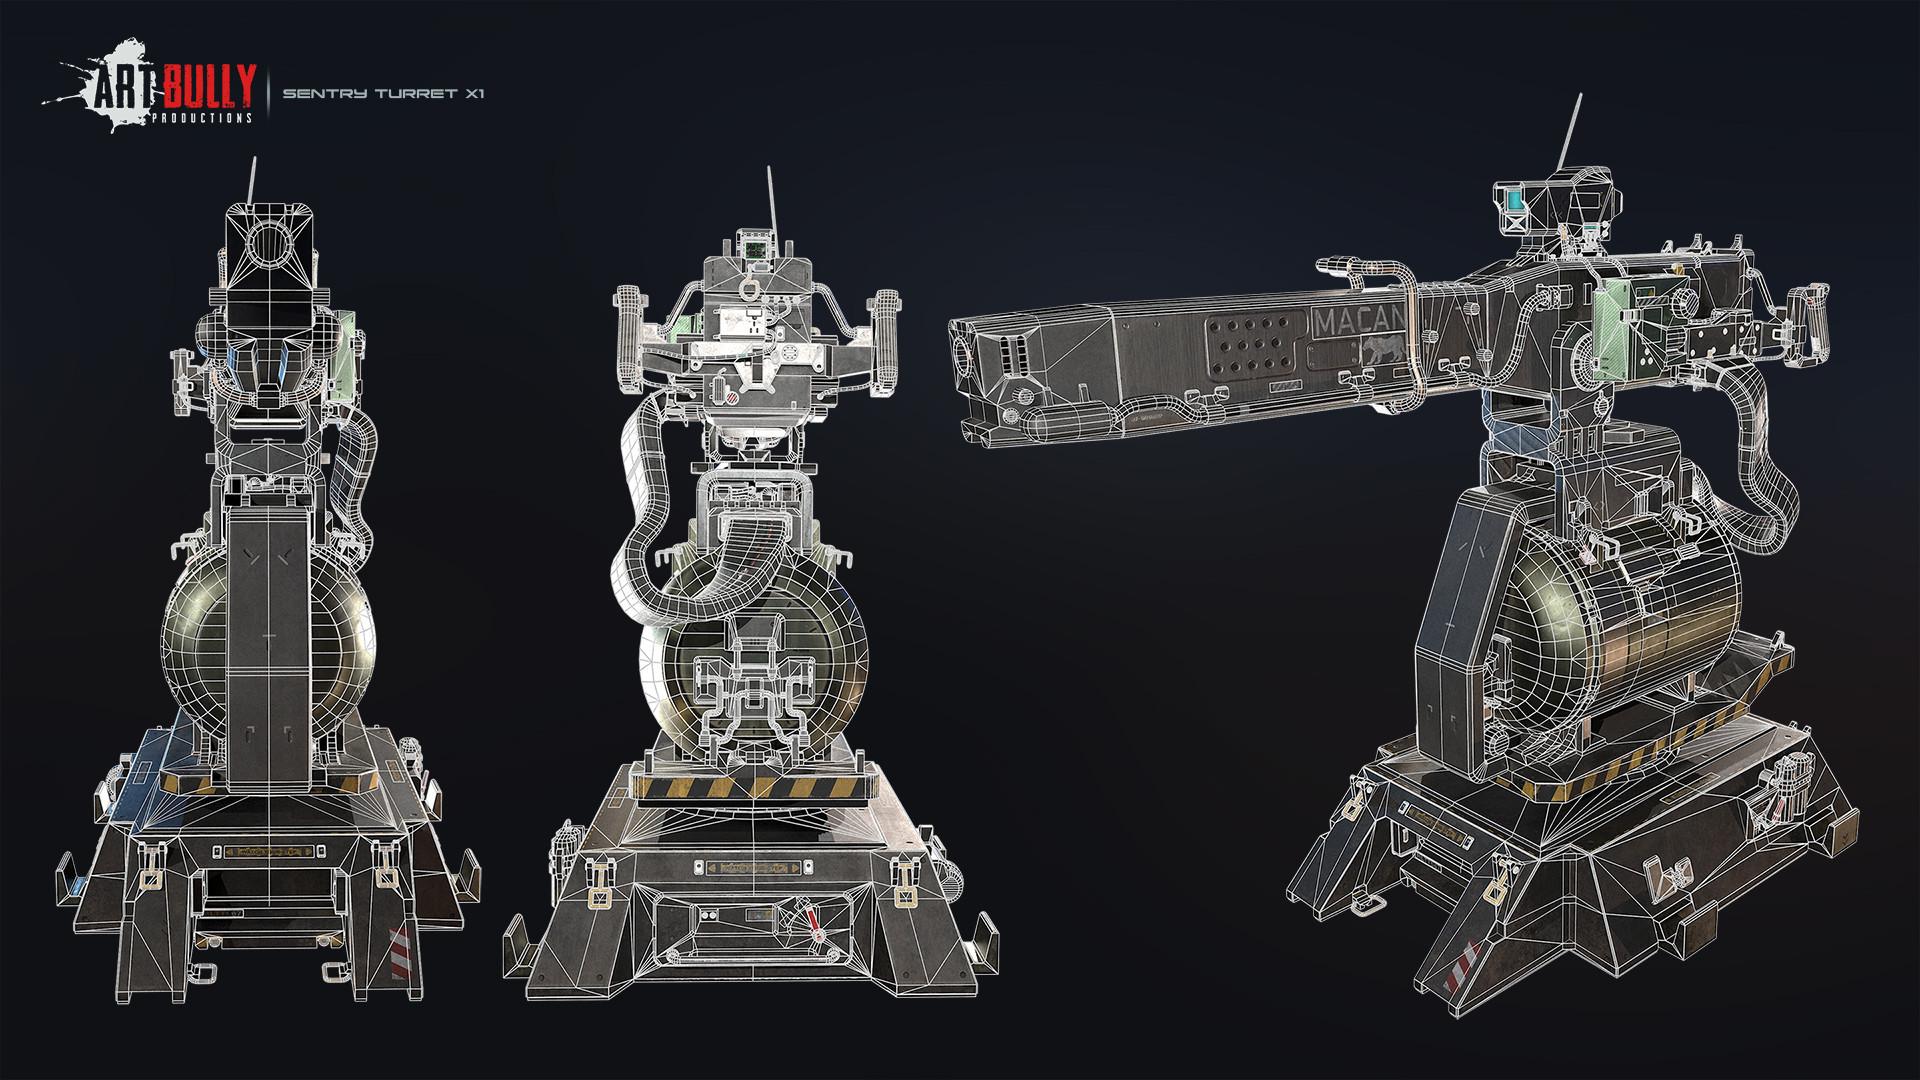 Patrick nuckels sentry turret x1 wireframe 01